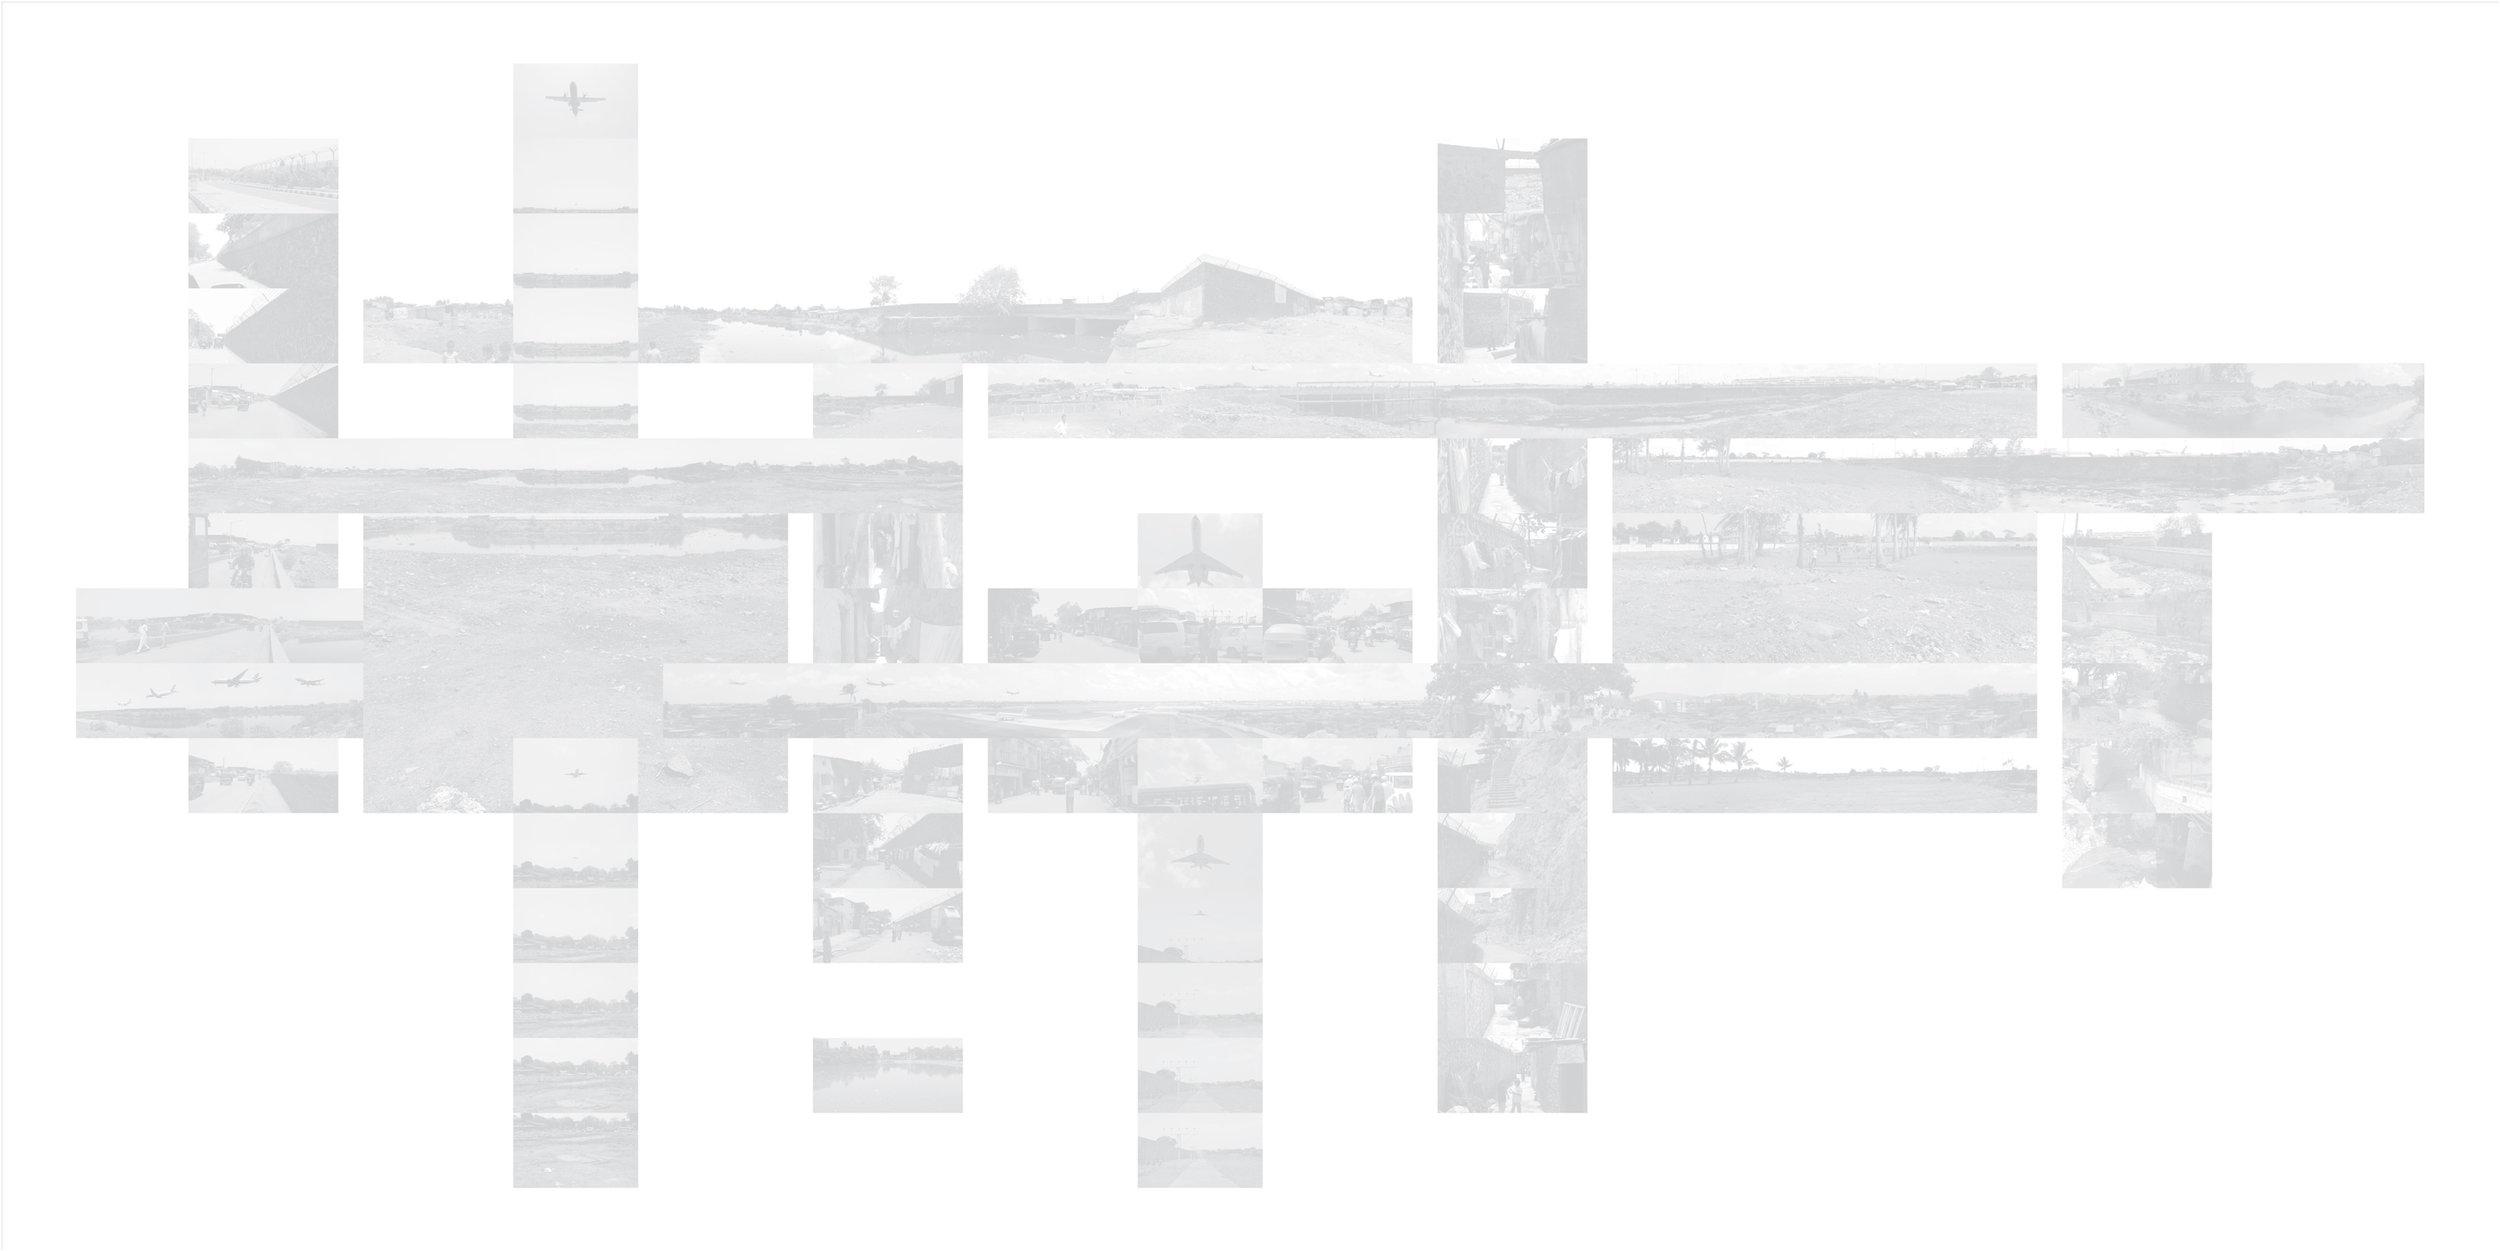 2_airport-crossing-diagram-photowork_1a.jpg